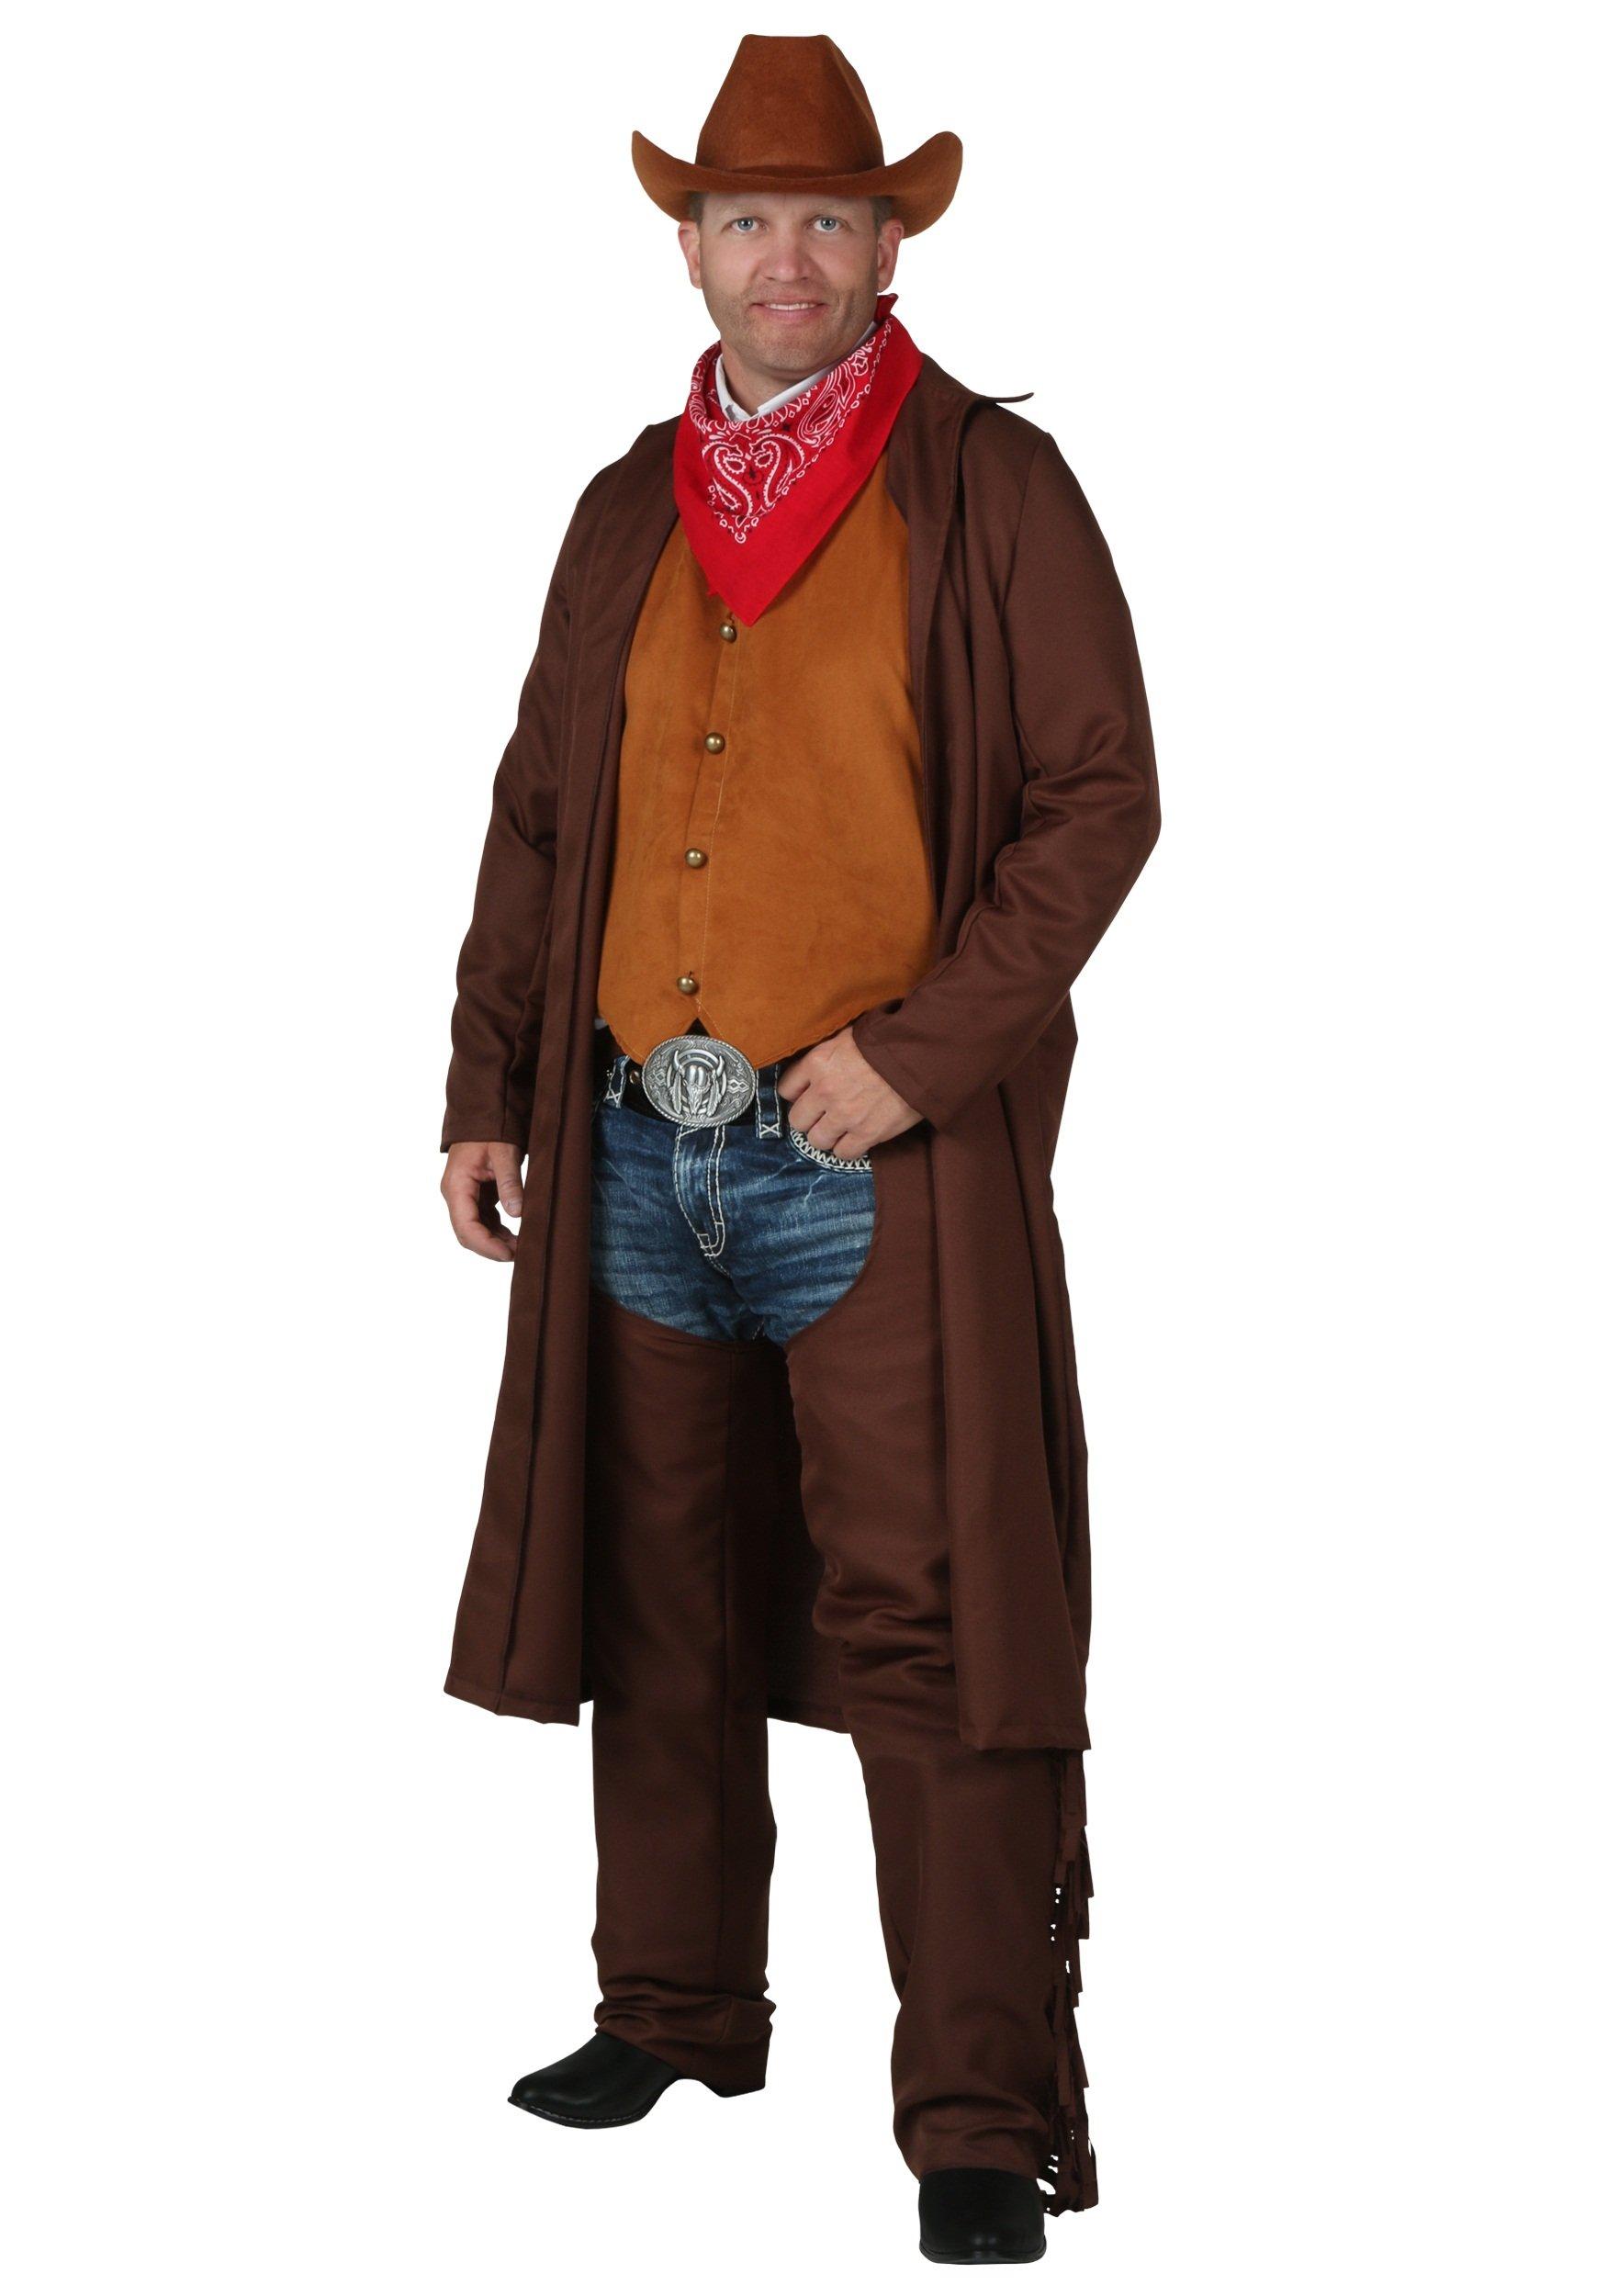 Adult Cowboy Costume Medium by FunCostumes